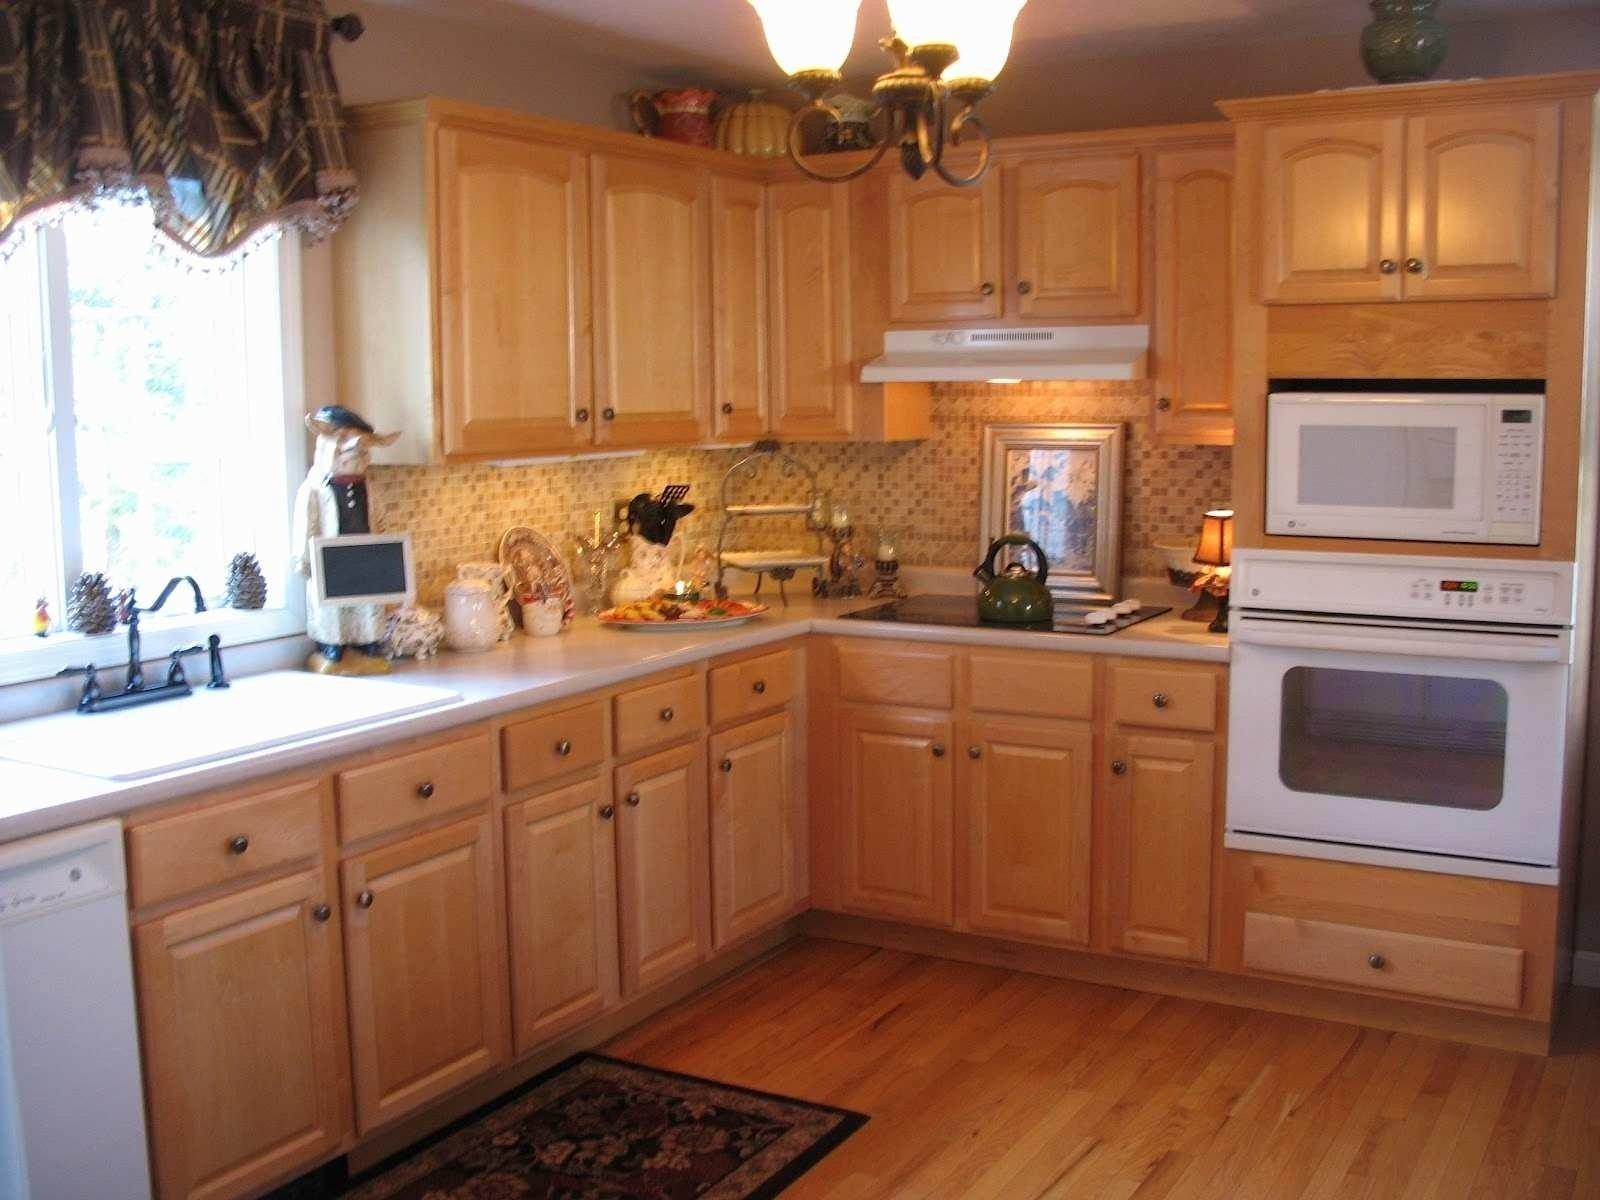 10 Best Kitchen Ideas With Oak Cabinets how to update oak kitchen cabinets fresh kitchen ideas with oak 2020